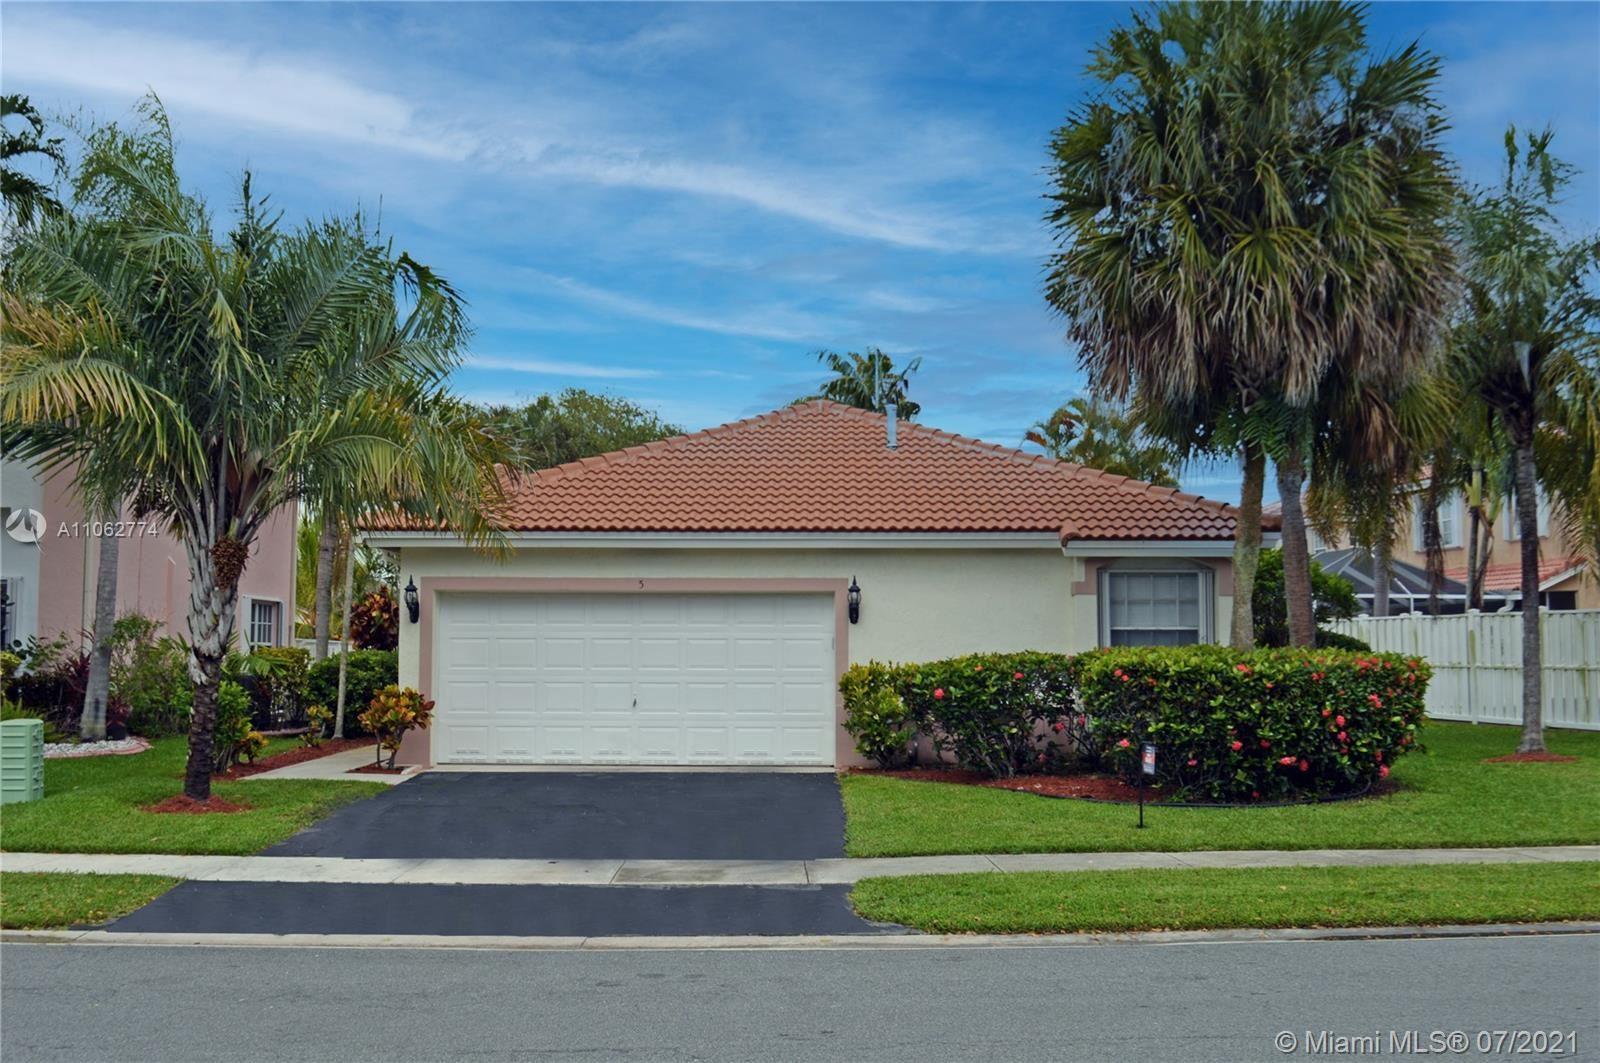 5 Gables Blvd, Weston, FL 33326 - #: A11062774